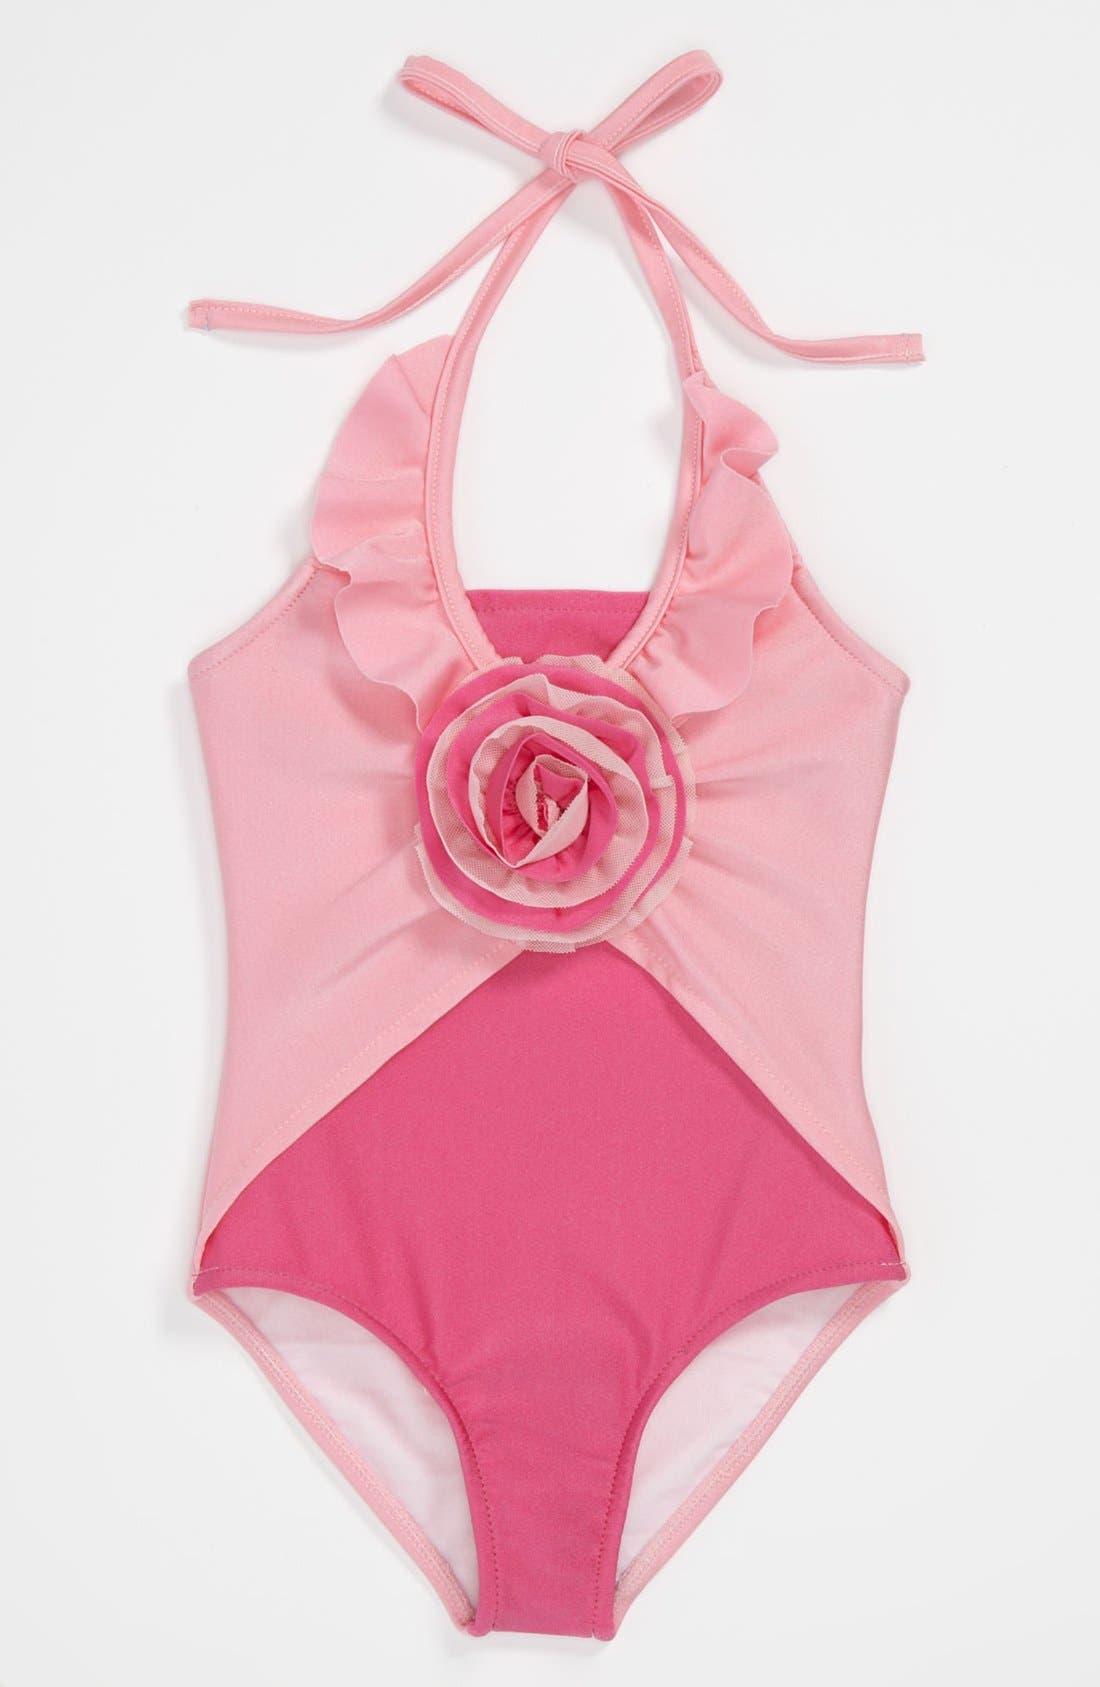 Alternate Image 1 Selected - Love U Lots One Piece Swimsuit (Toddler, Little Girls & Big Girls)